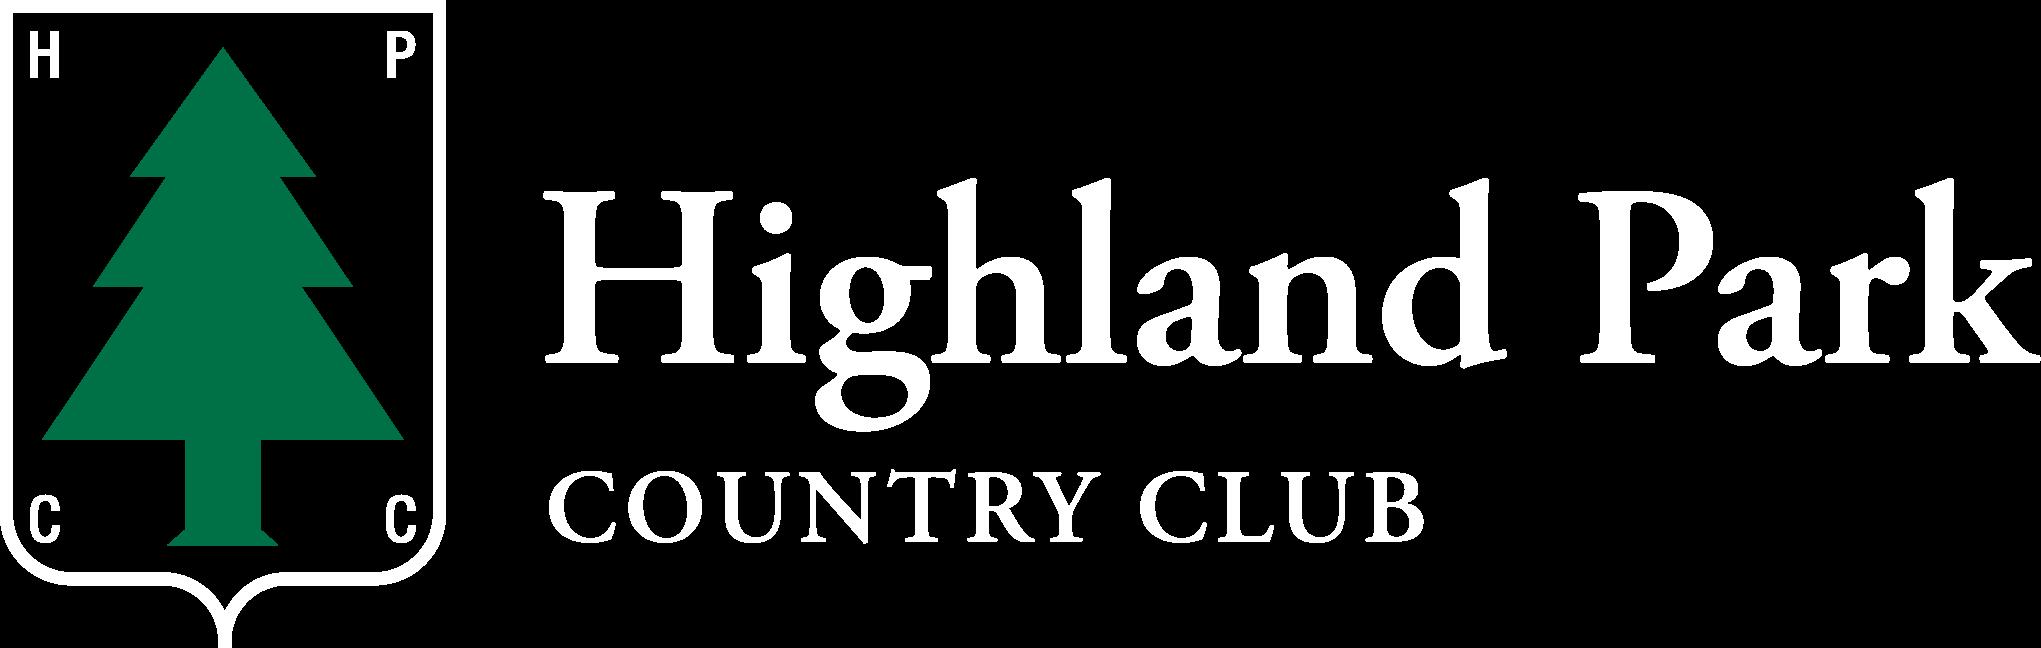 Highland-Park-Country-Club-LOGO-v02-blanco.png